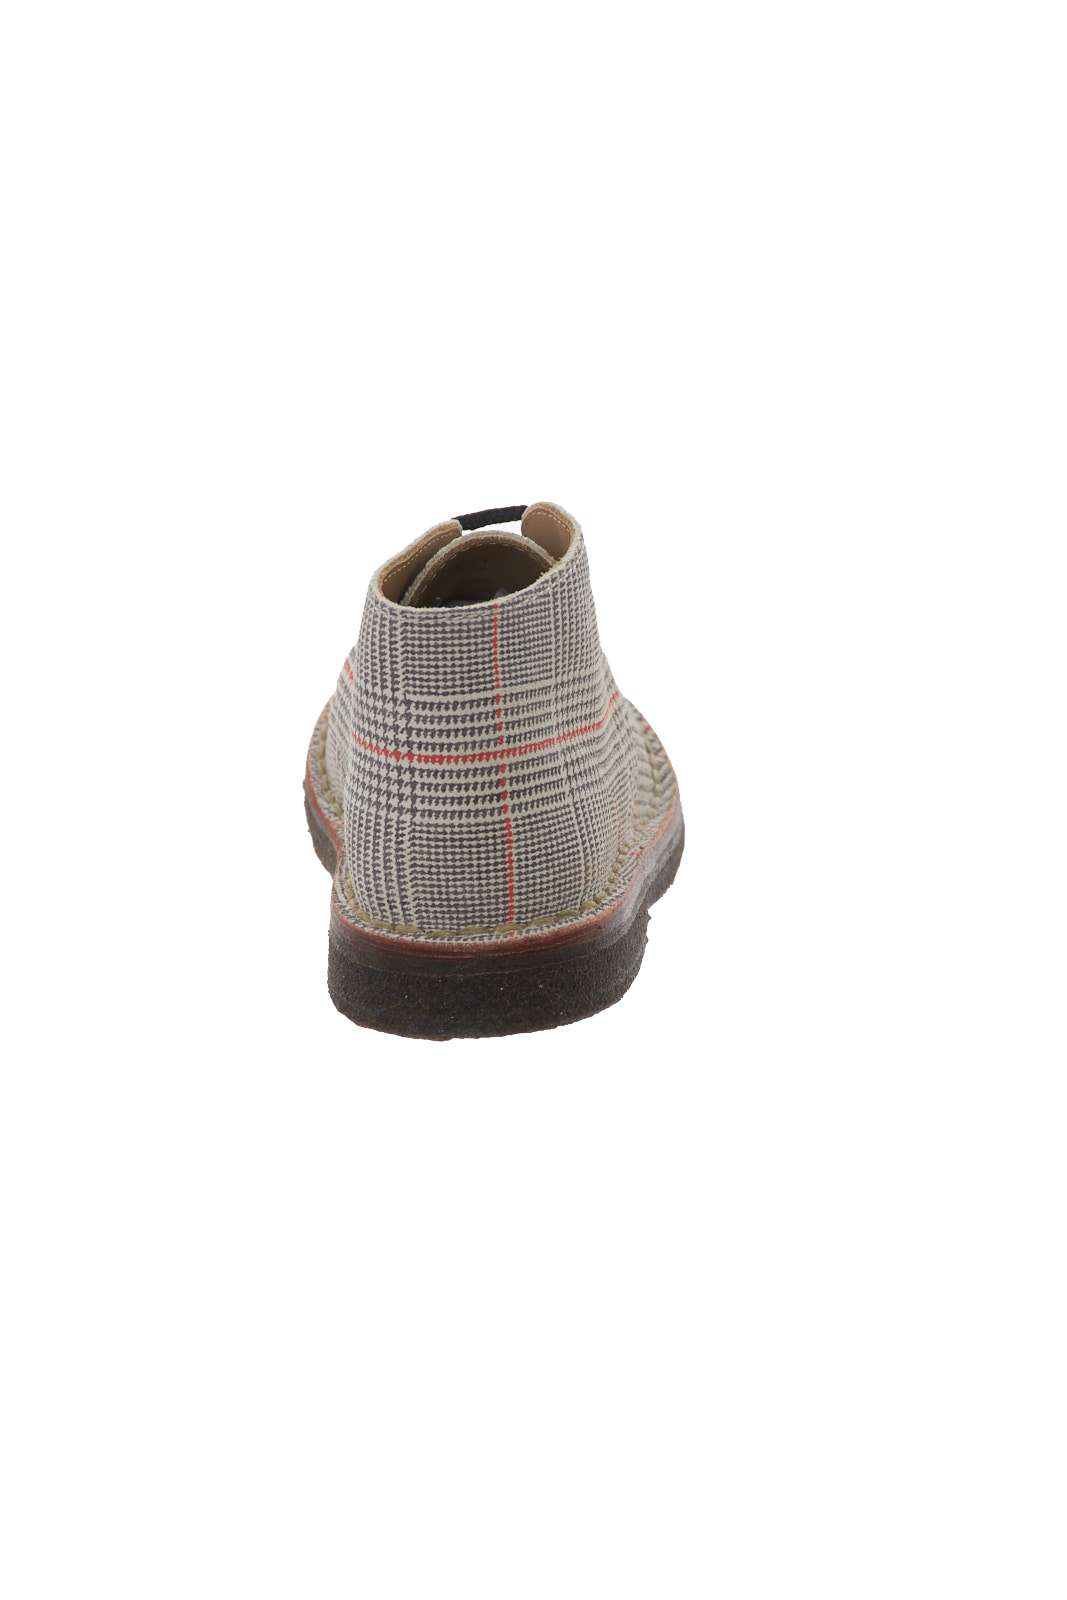 https://www.parmax.com/media/catalog/product/P/E/PE-outlet_parmax-scarpa-bambino-P_P_-01016-D.jpg